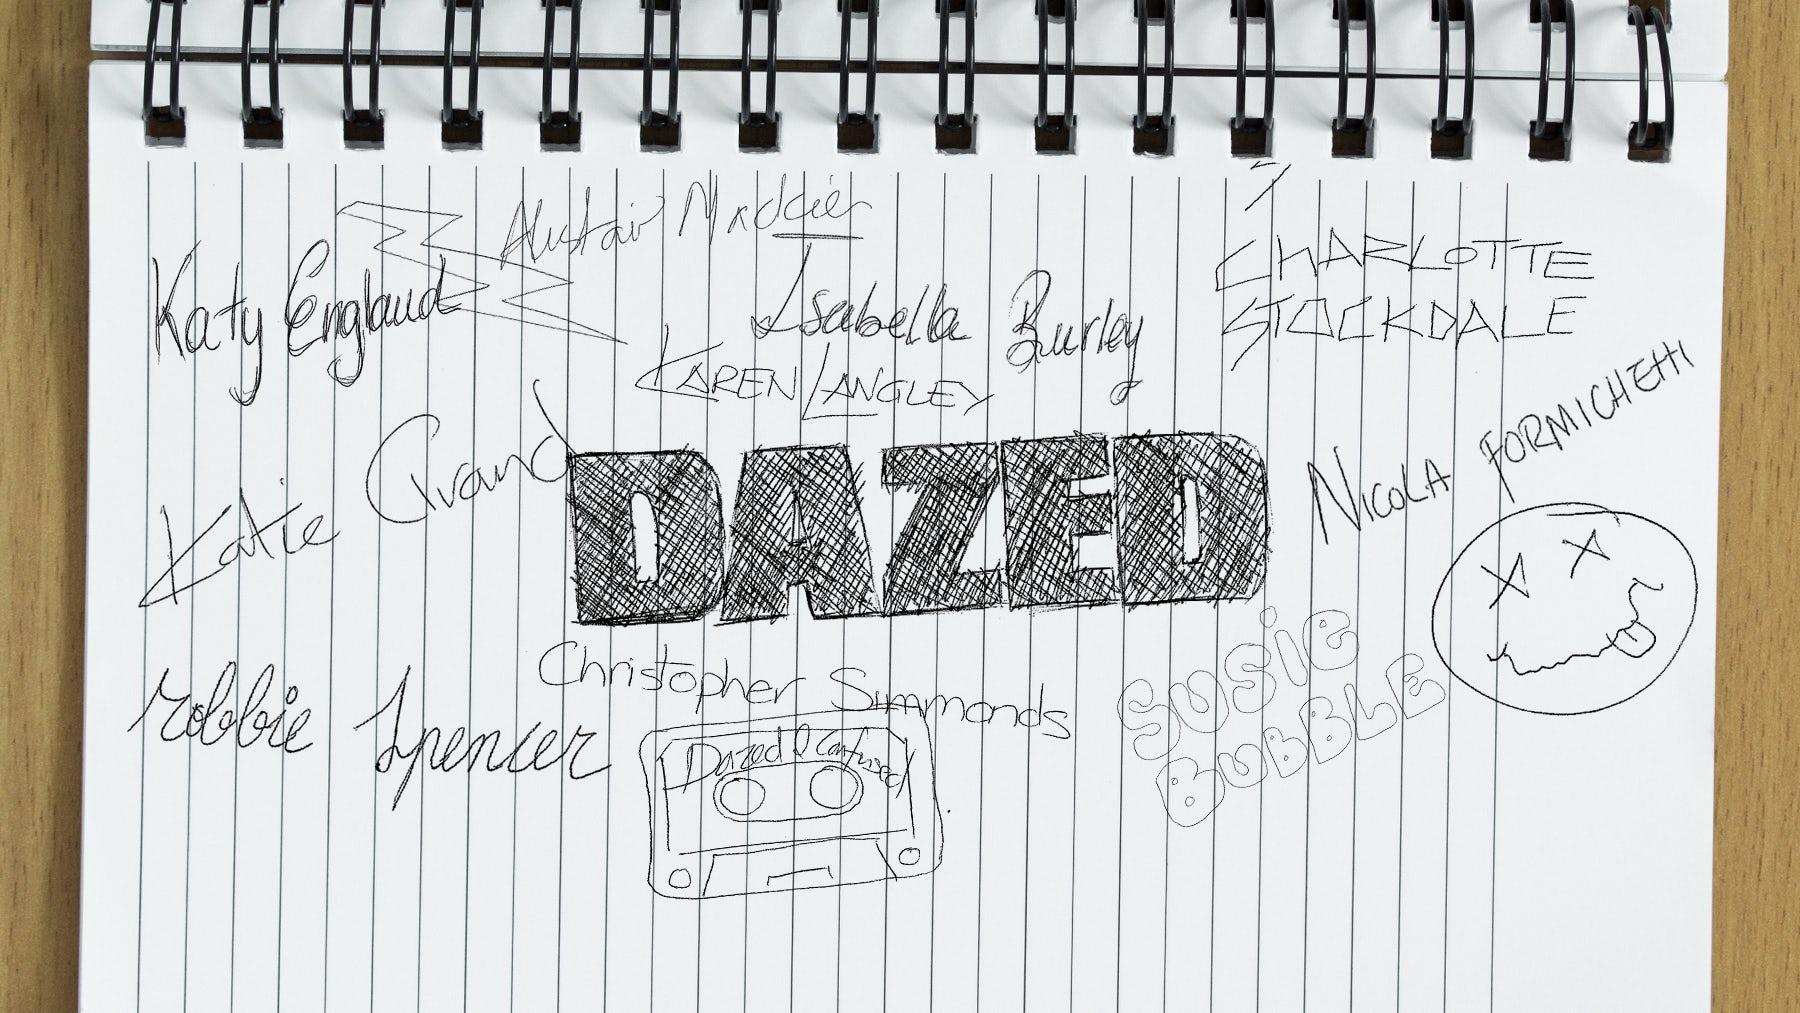 The School of Dazed